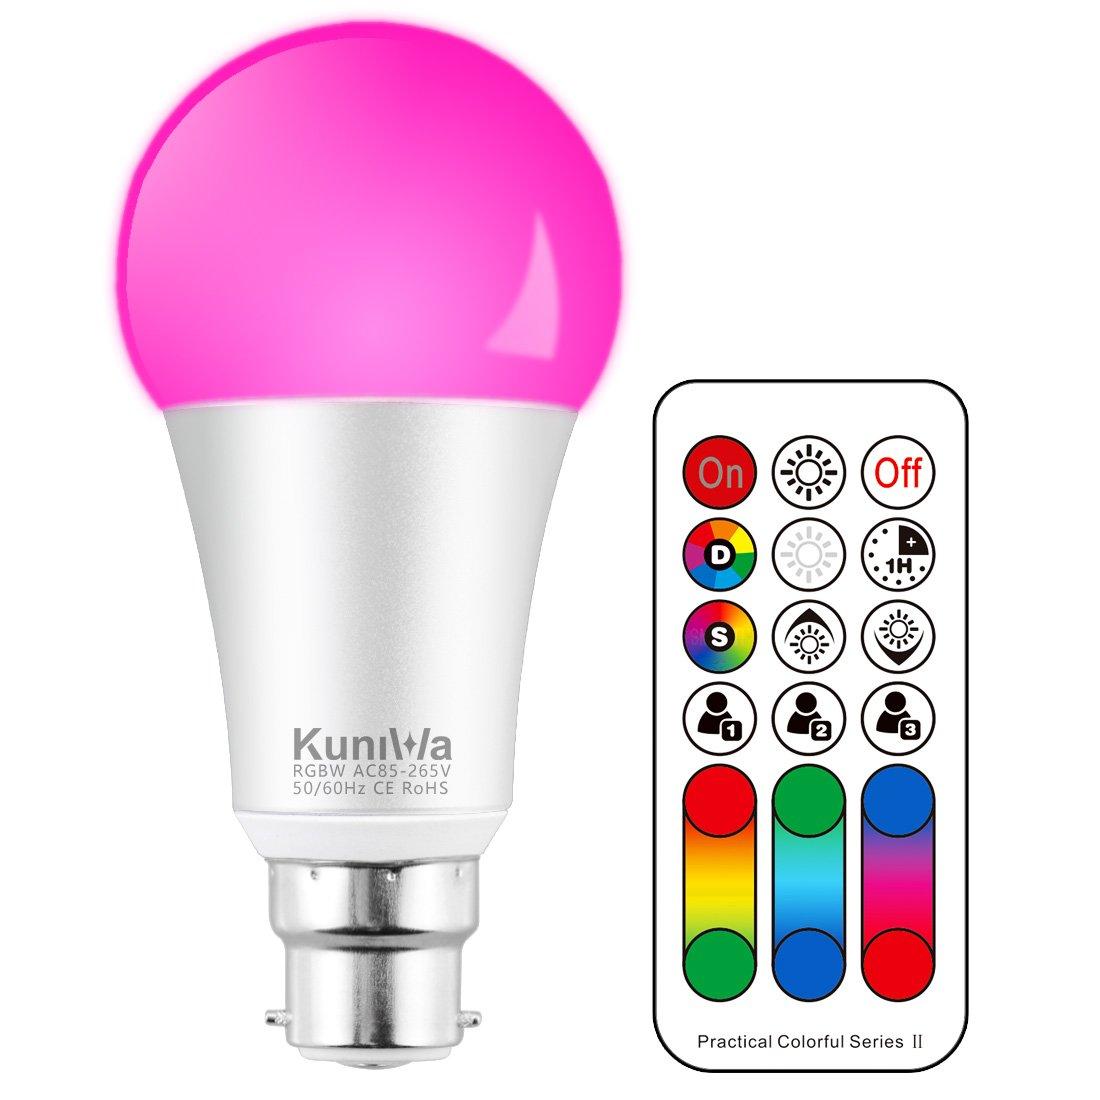 LED Farbige Licht Leuchtmit RGB LED Leuchtmittel Dimmbar mit Fernbedienung B22 10W, Kuniwa RGBW LED Lampen, Farbwechsel Lampen LED Birnenmit 120 Farben